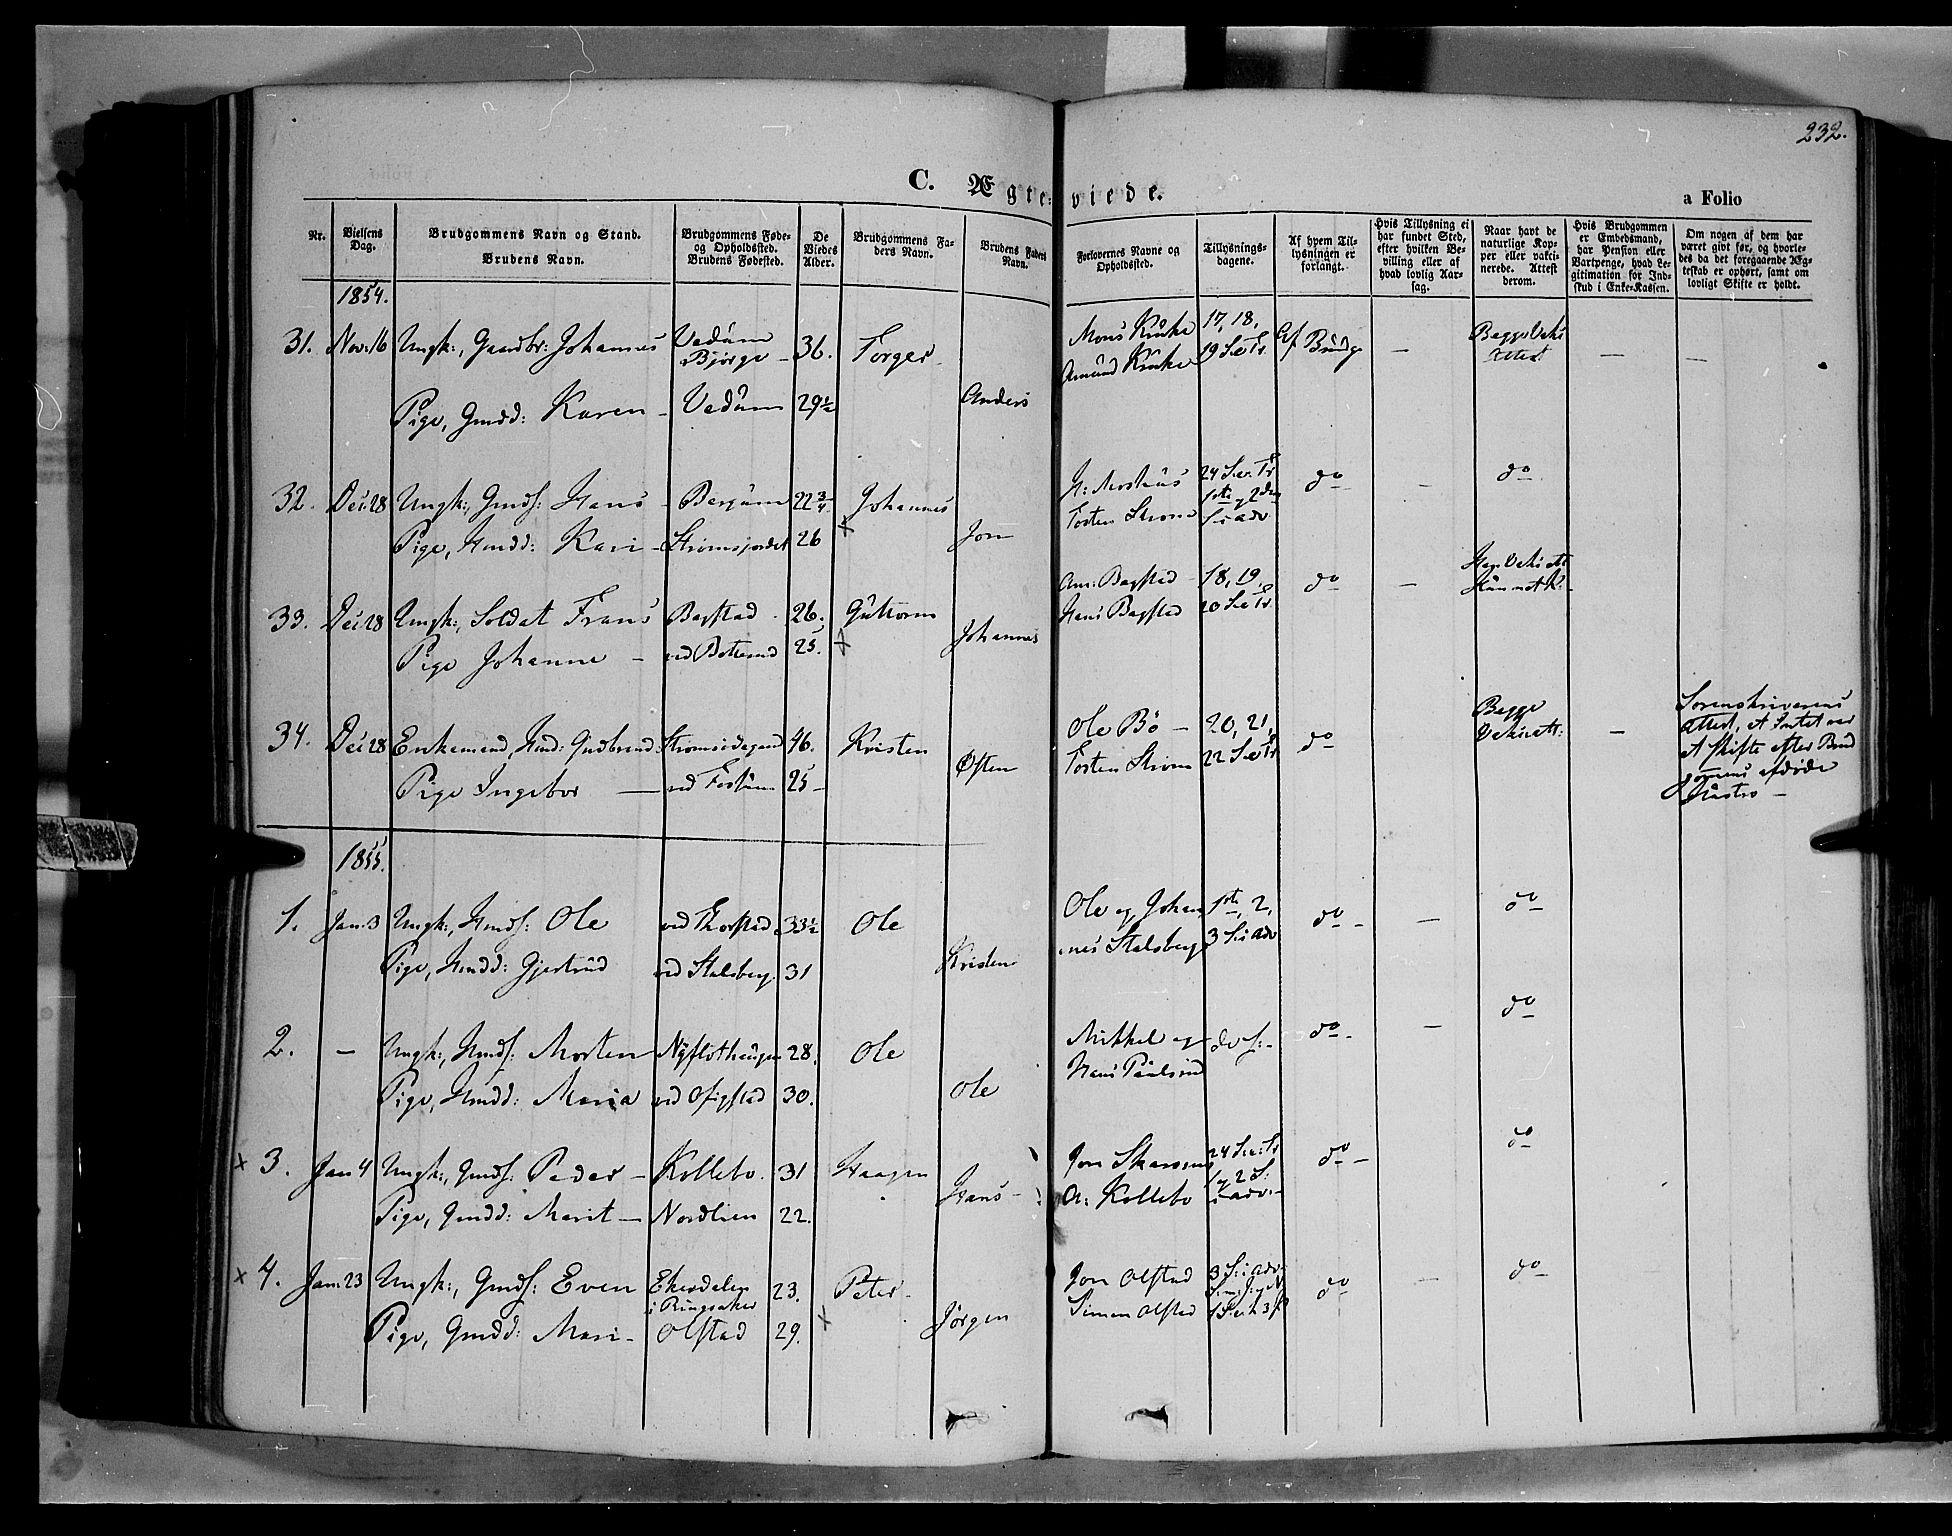 SAH, Øyer prestekontor, Ministerialbok nr. 5, 1842-1857, s. 232